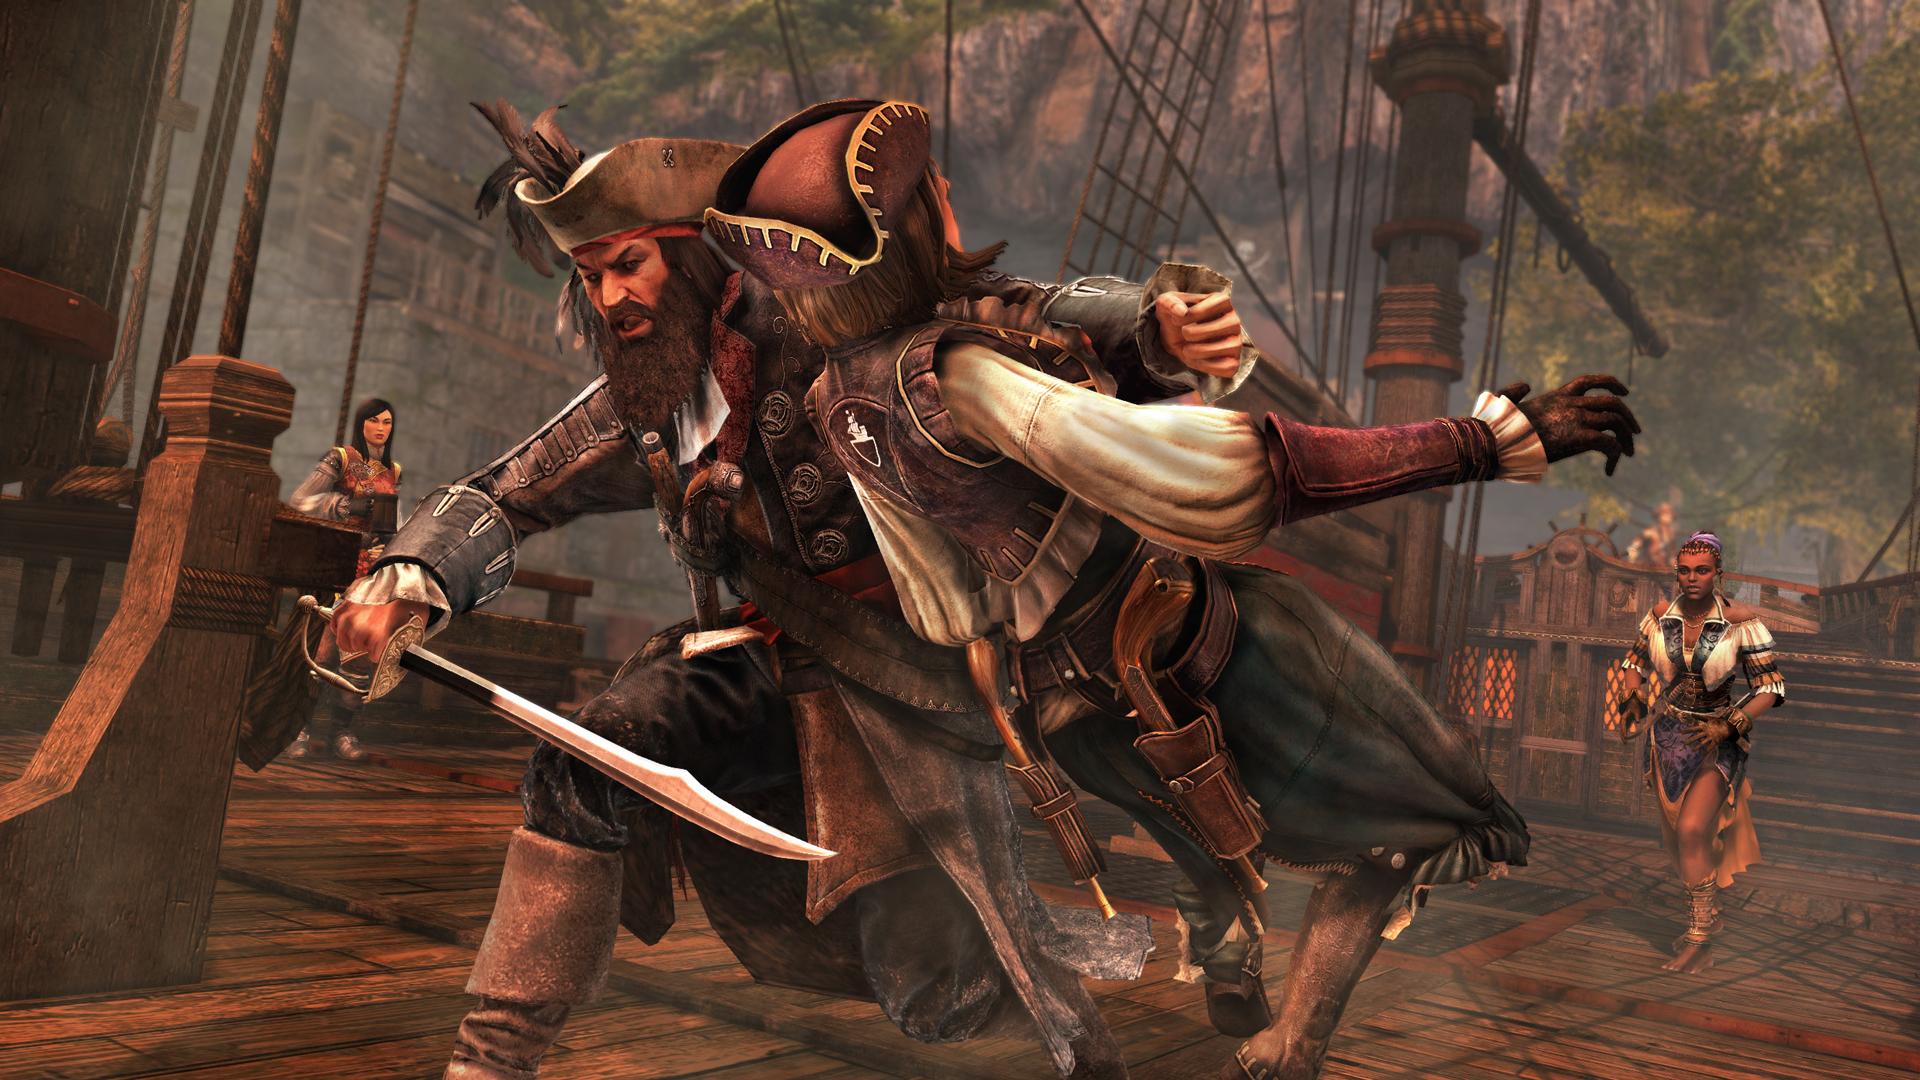 image - ac4 - blackbeard vs lady black | assassin's creed wiki